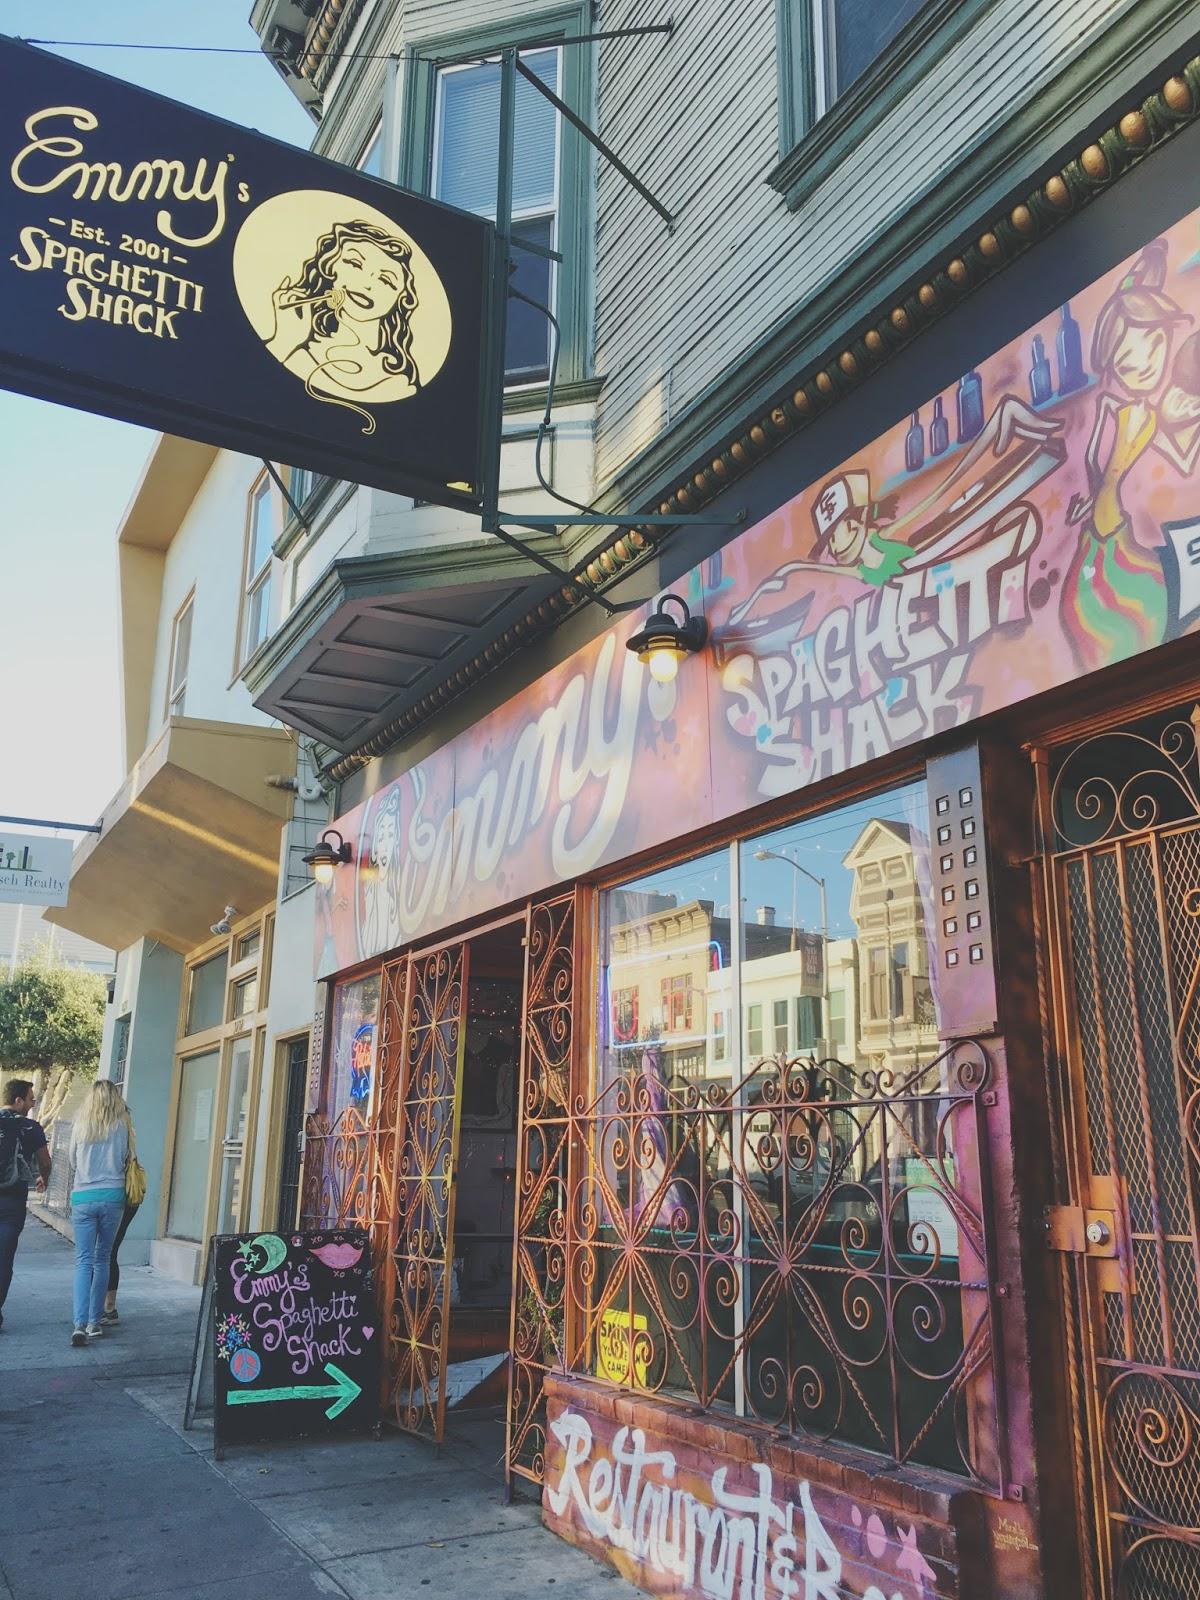 Emmy's Spaghetti Shack - a restaurant in San Francisco, California